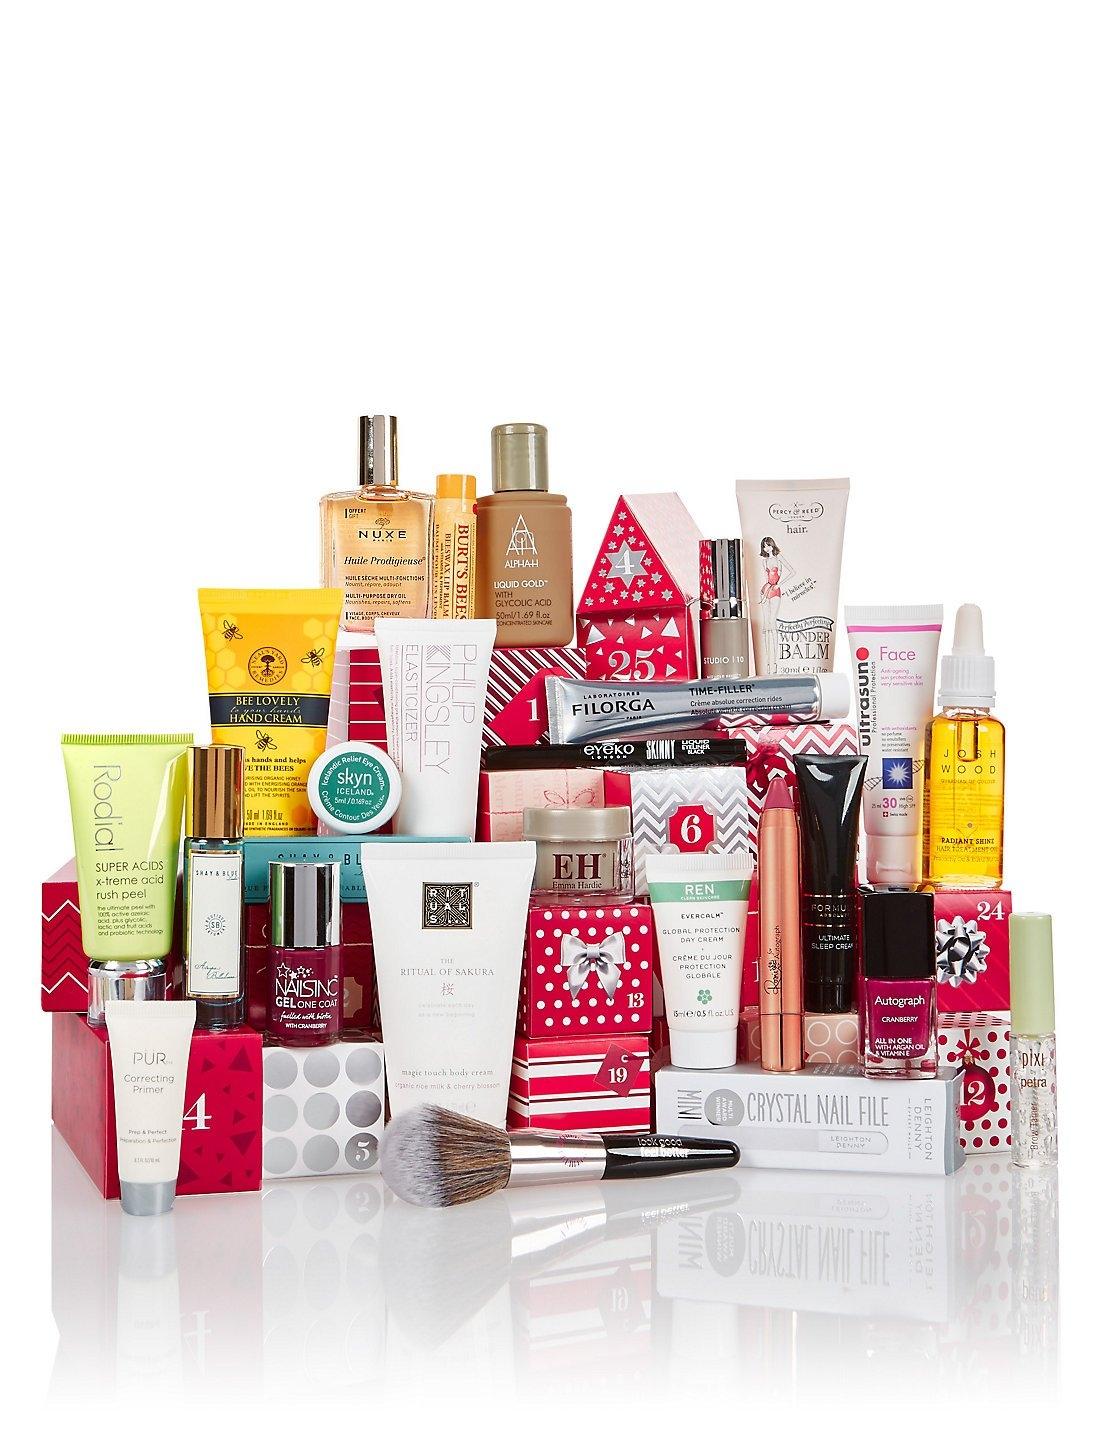 M&s Beauty Advent Calendar – £35 When You Spend £35+ | 2019 Diy How M&s Beauty Advent Calendar 2019